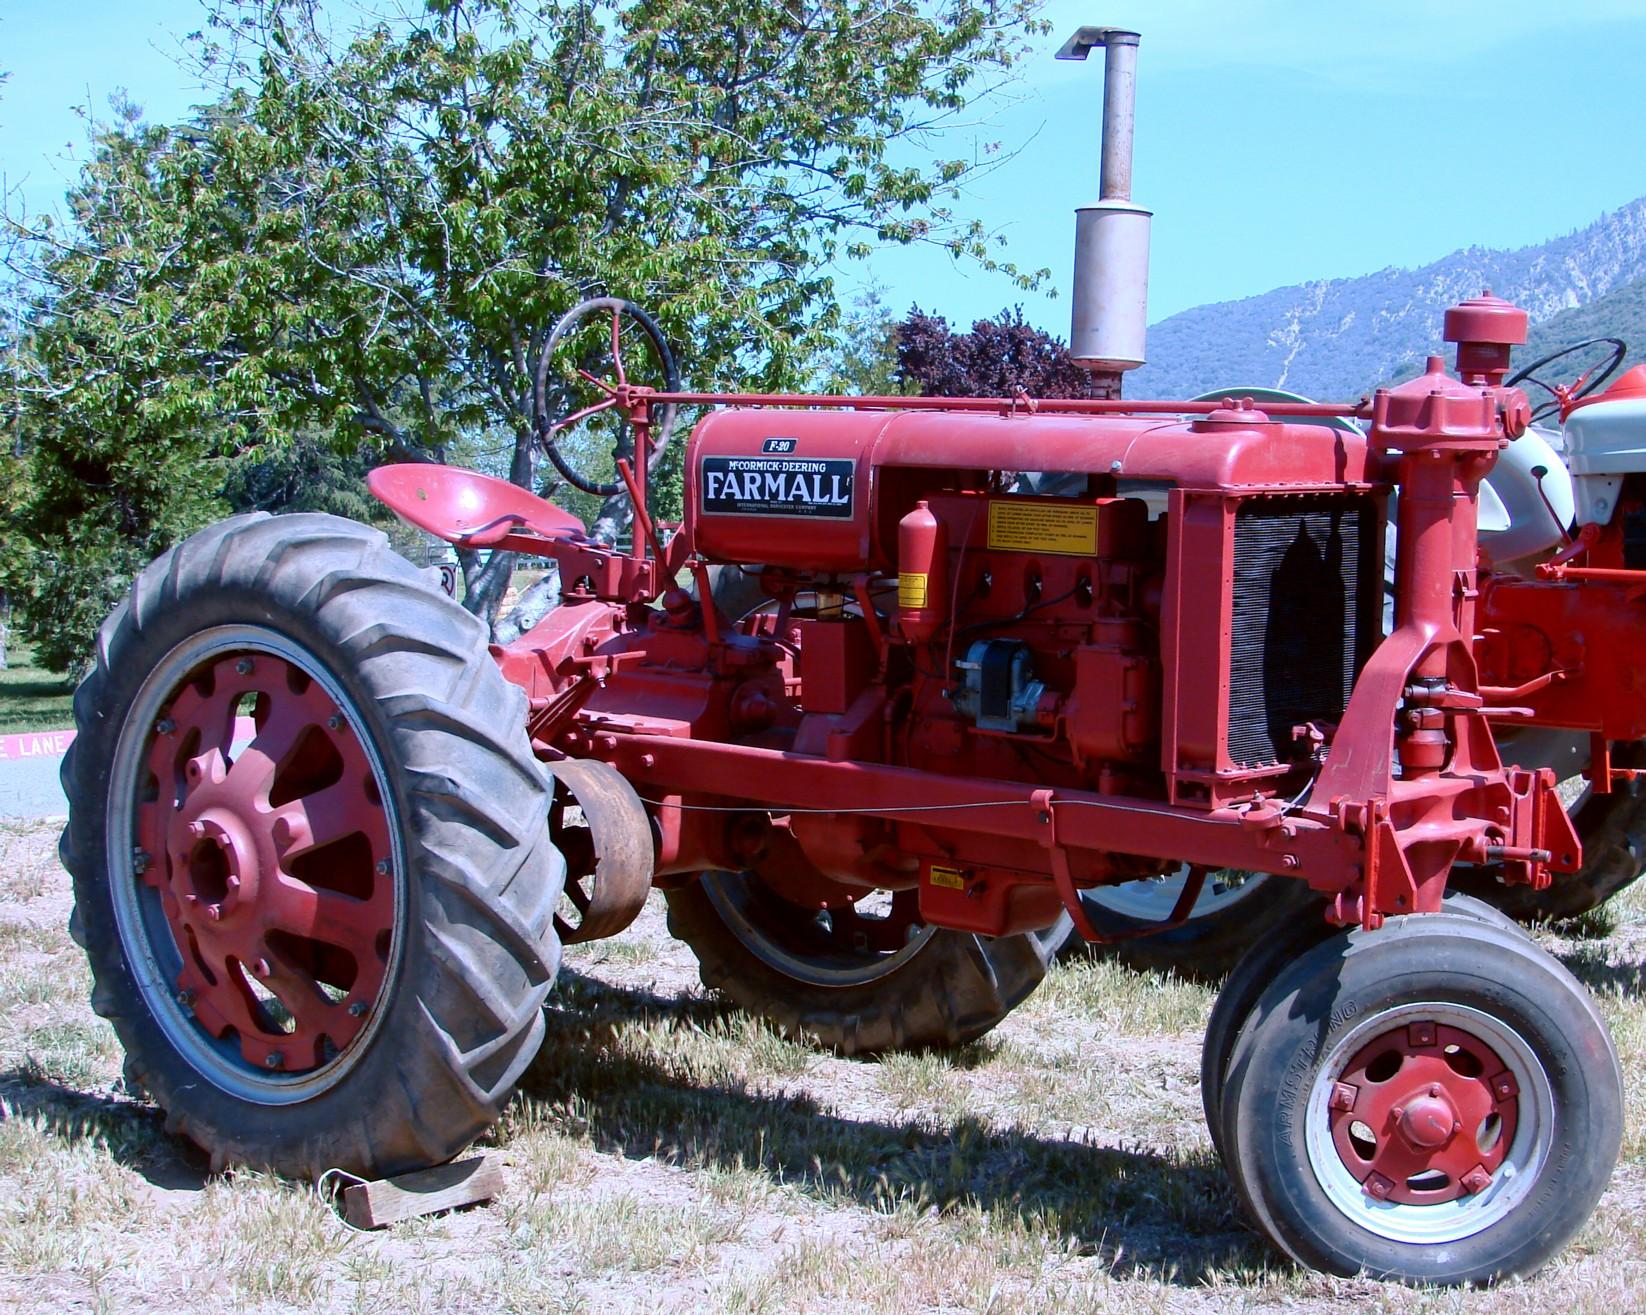 File:Farmall (International Harvester) Tractor (1950?) (5897877331).